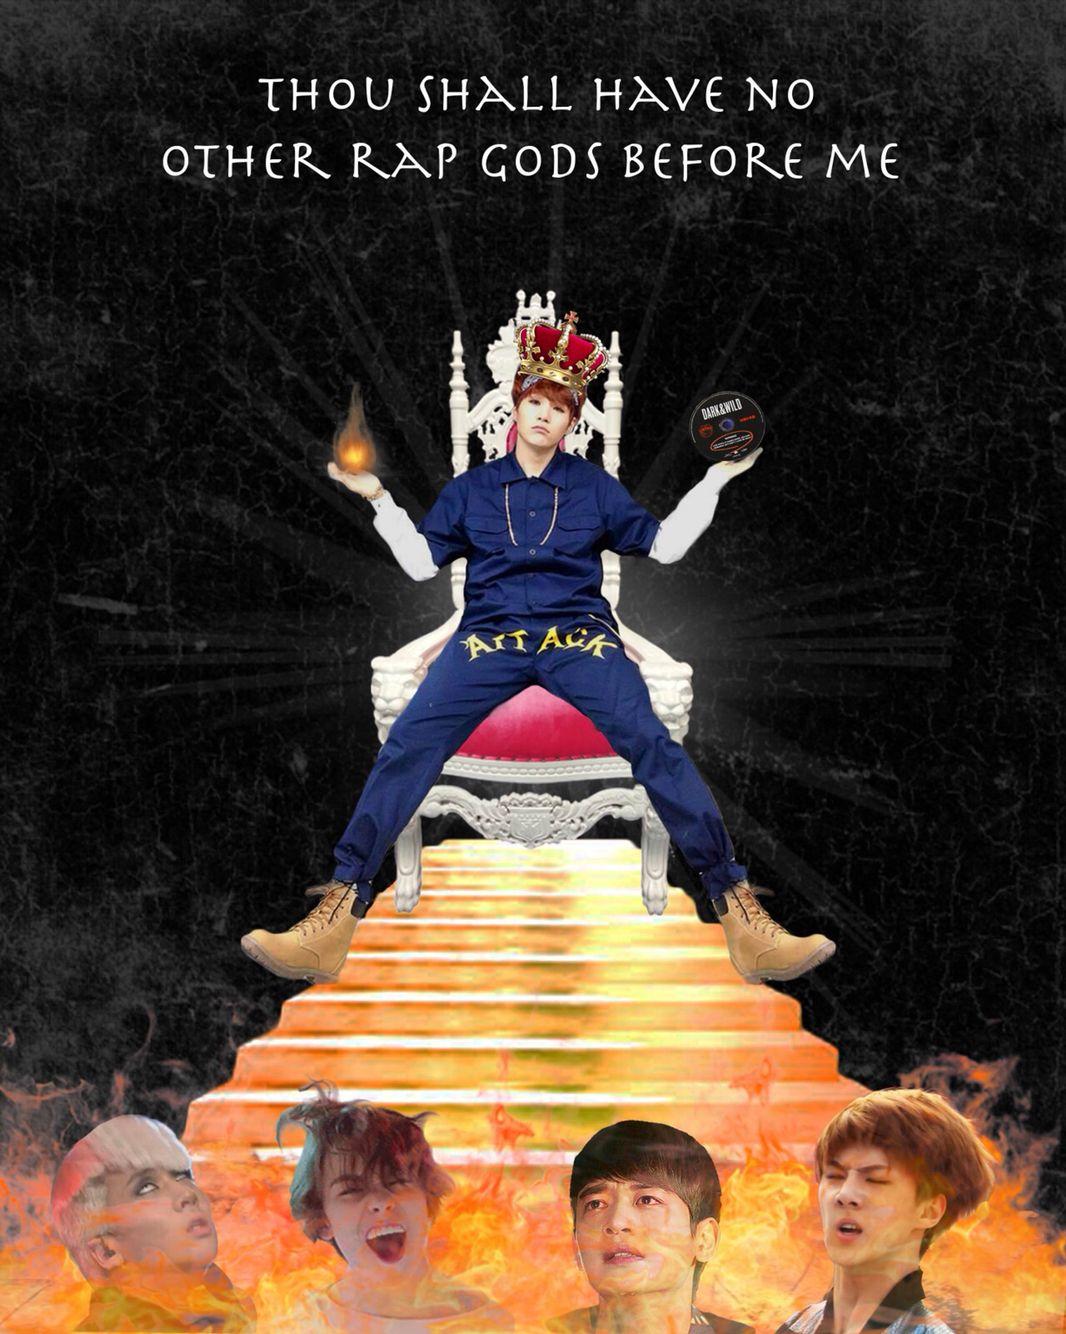 Pin By Zehra Khan On K Pop Rap God Kpop Memes Most Viewed Youtube Videos